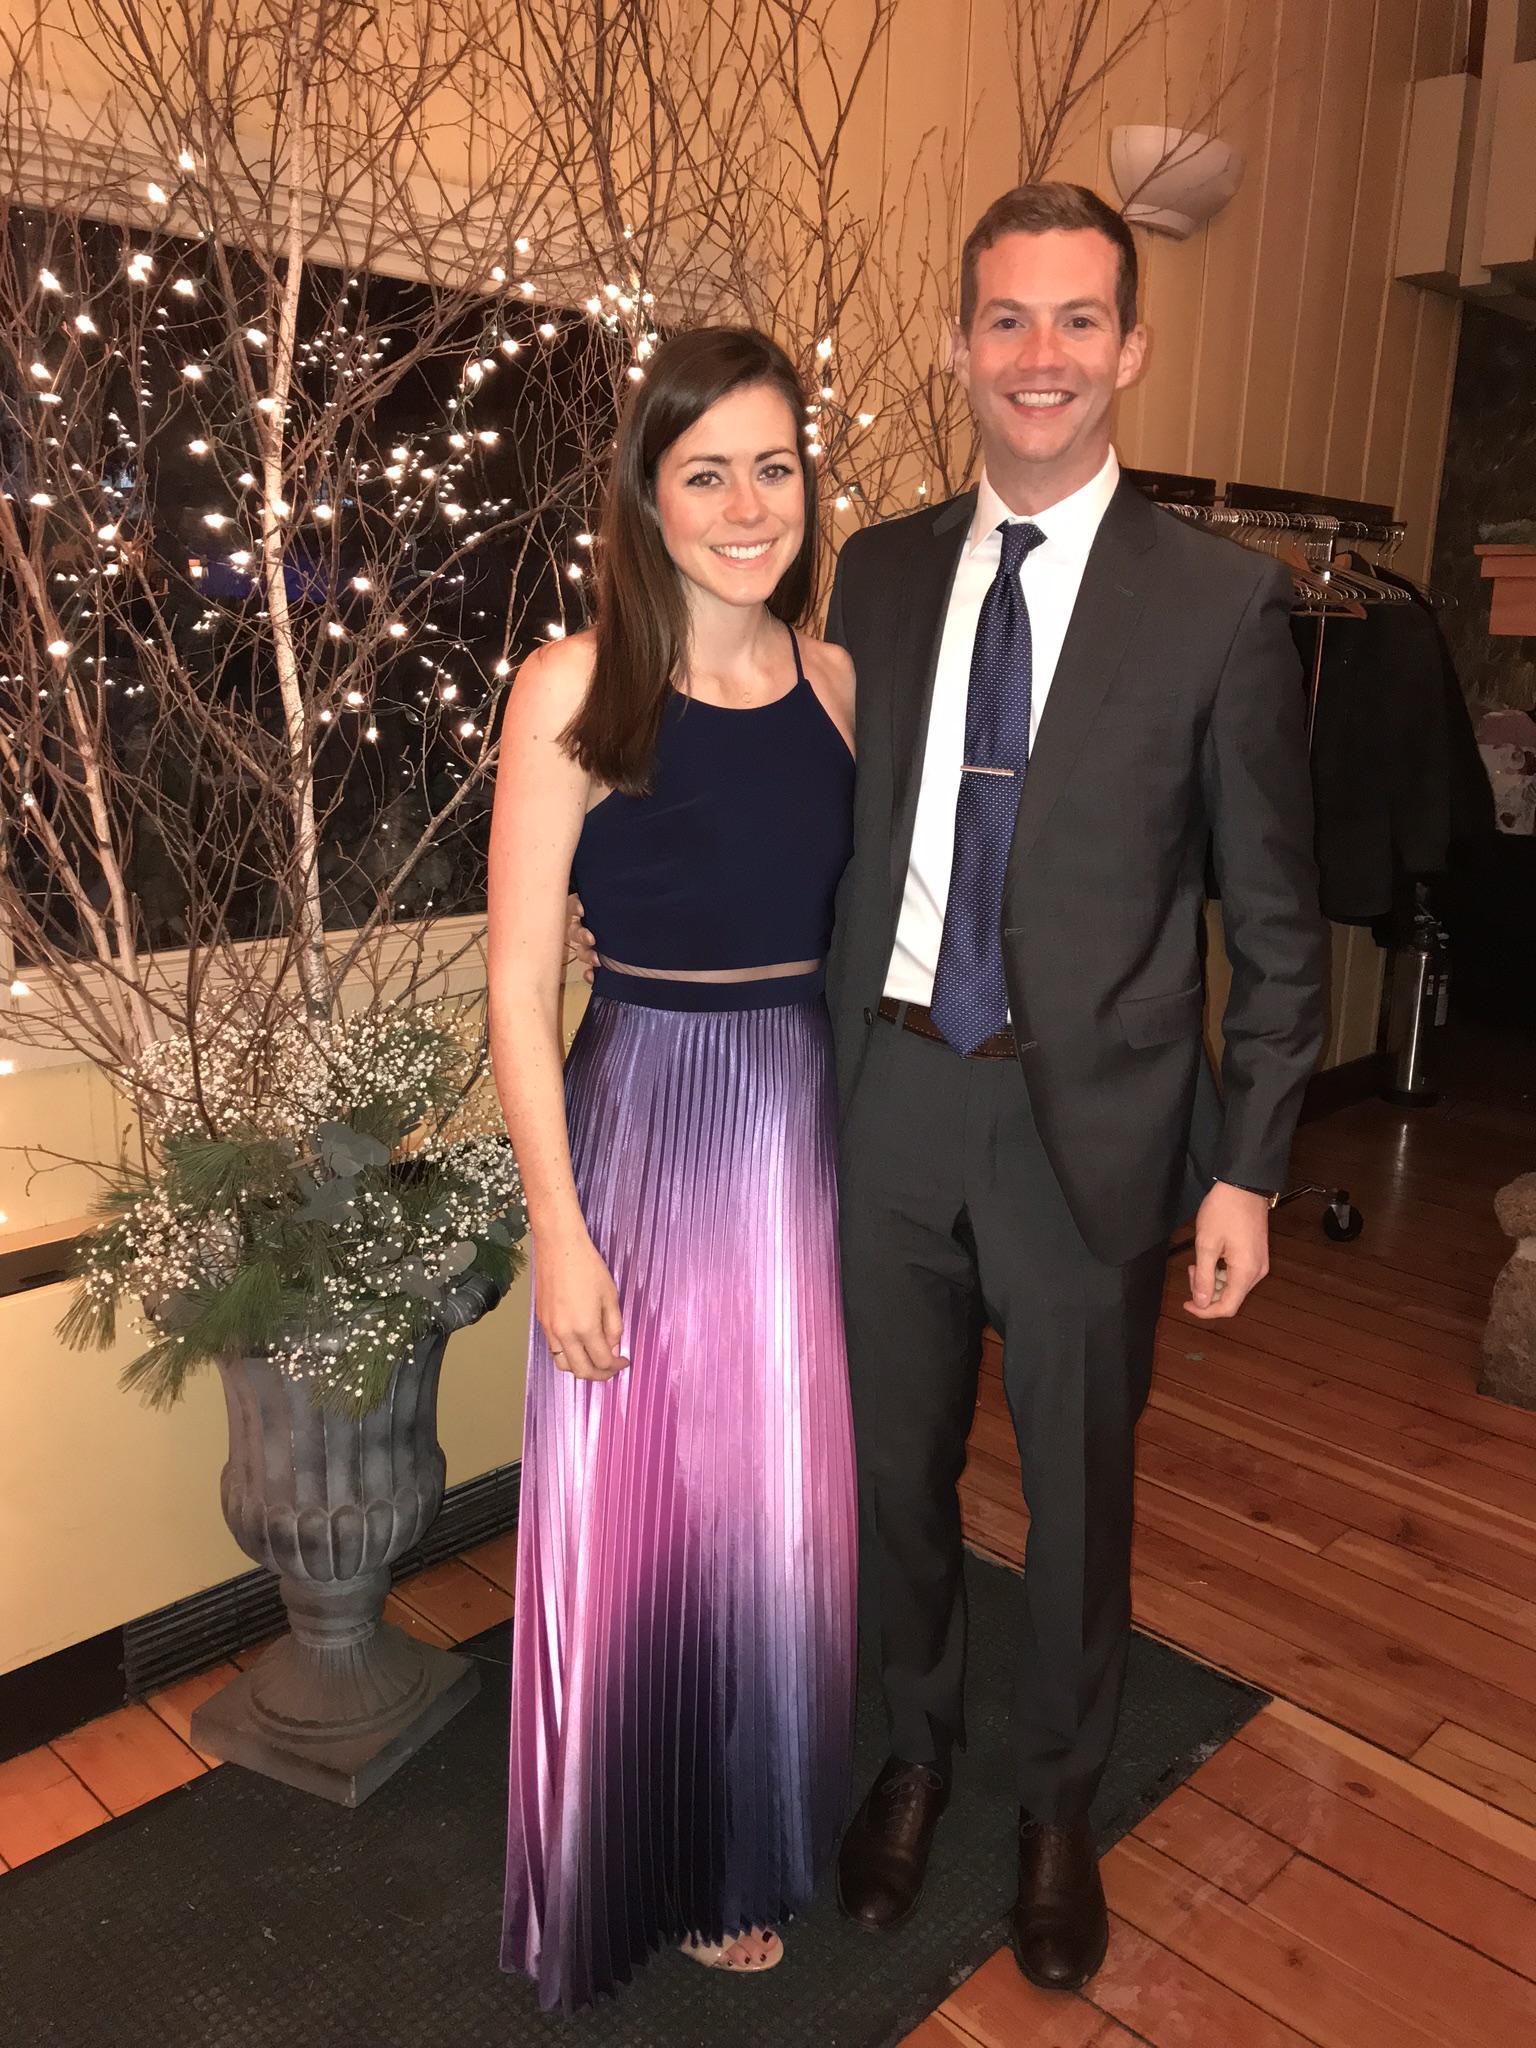 NYE Wedding, Boston, MA 2017